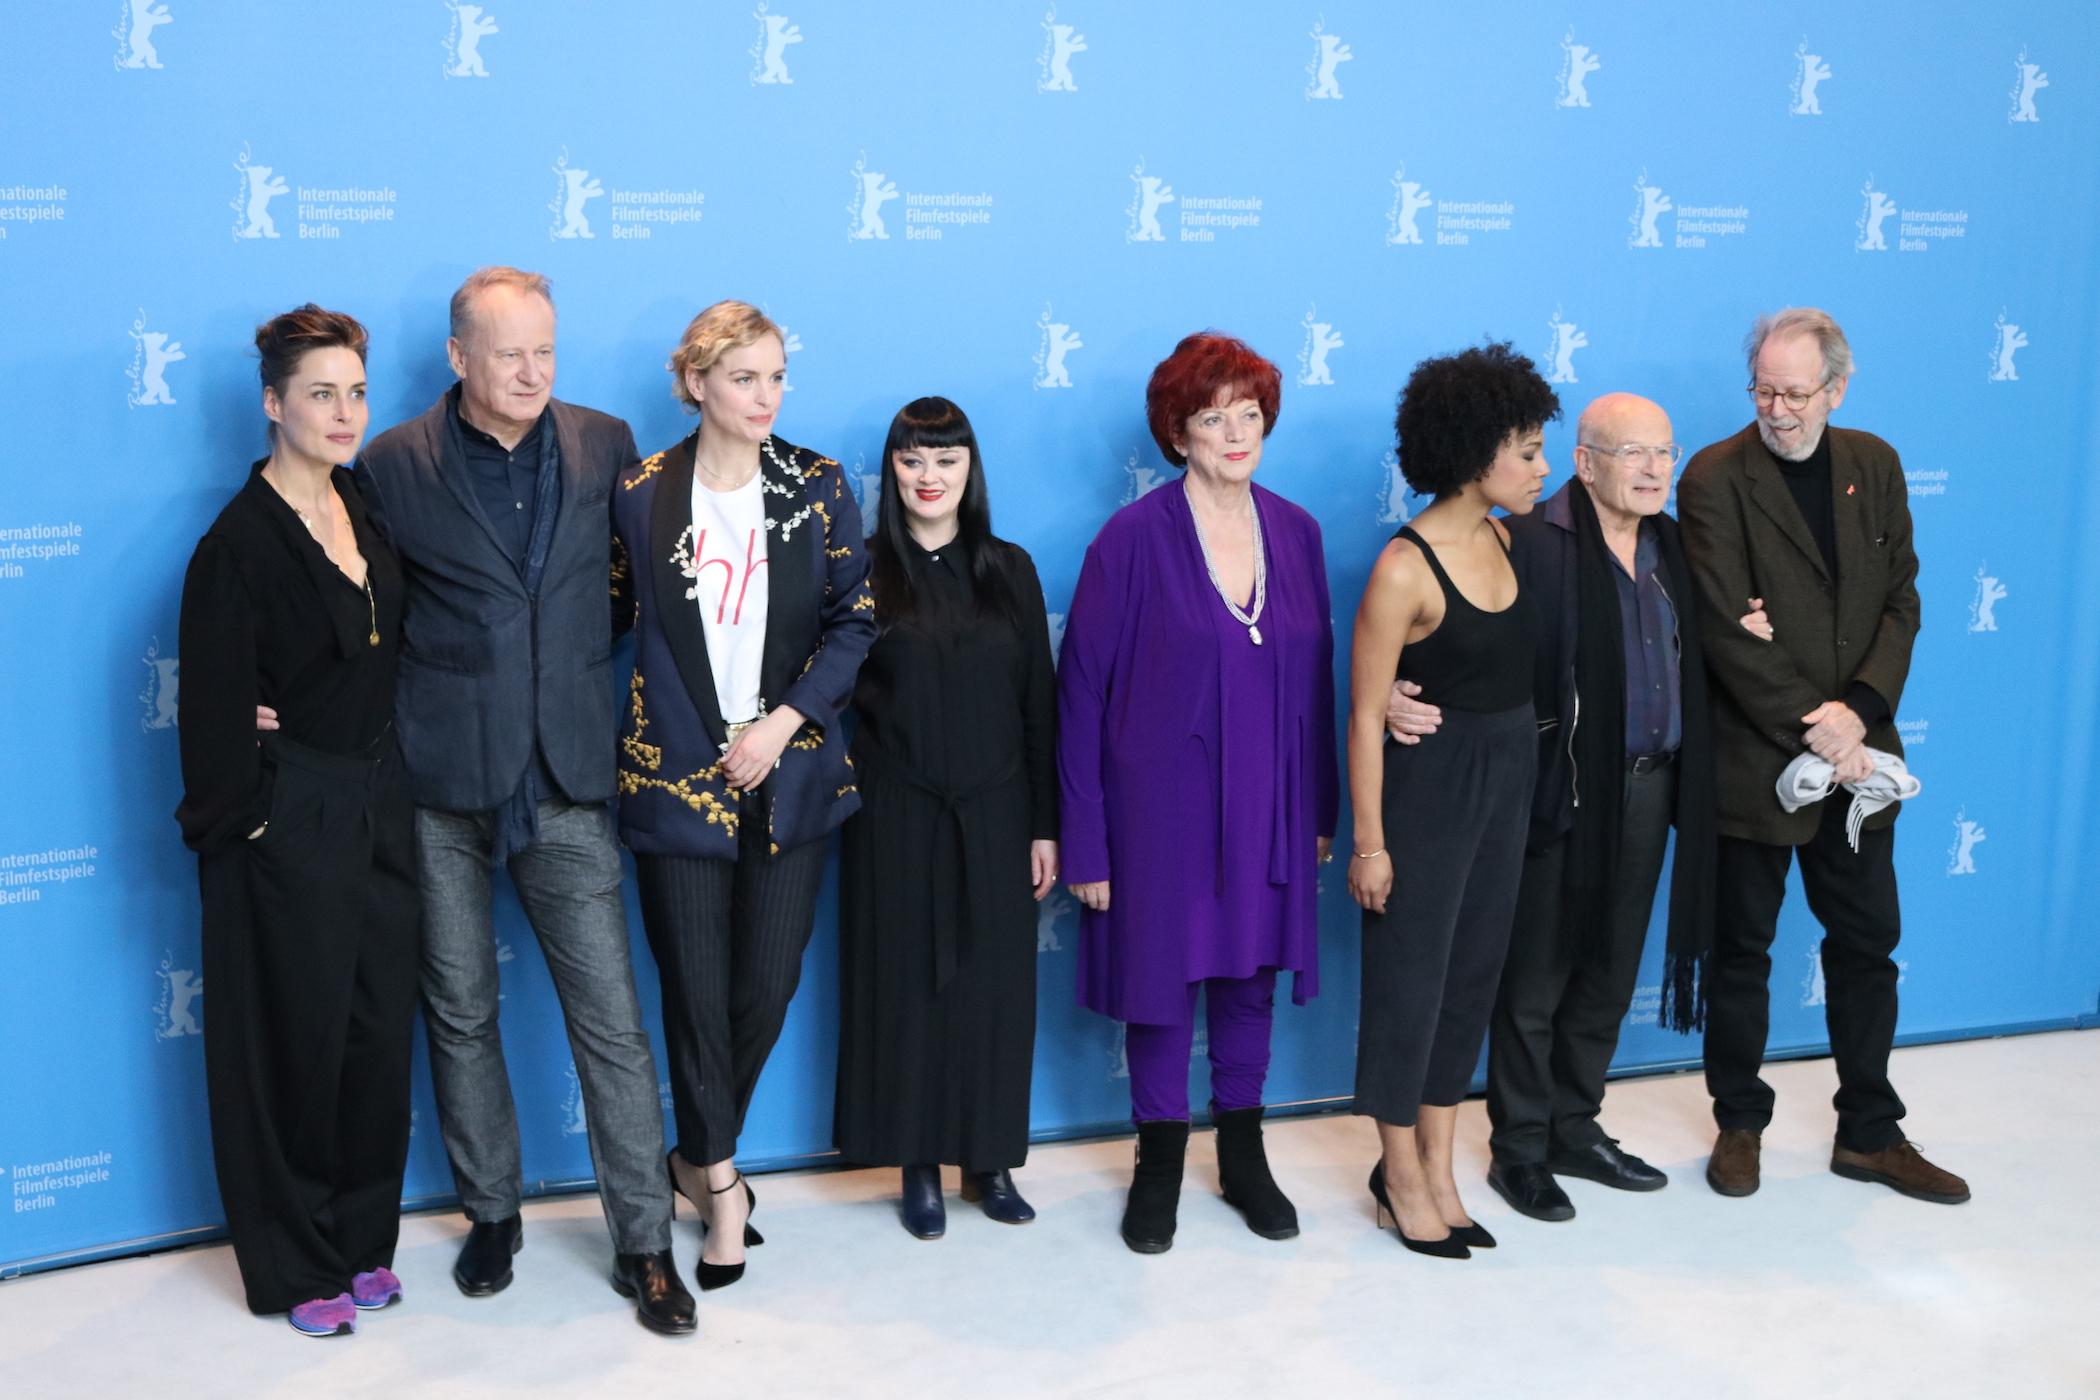 Berlino 2017: Volker Schlöndorff, Nina Hoss, Susanne Wolff, Stellan Skarsgård al Photocall di Return to Montauk